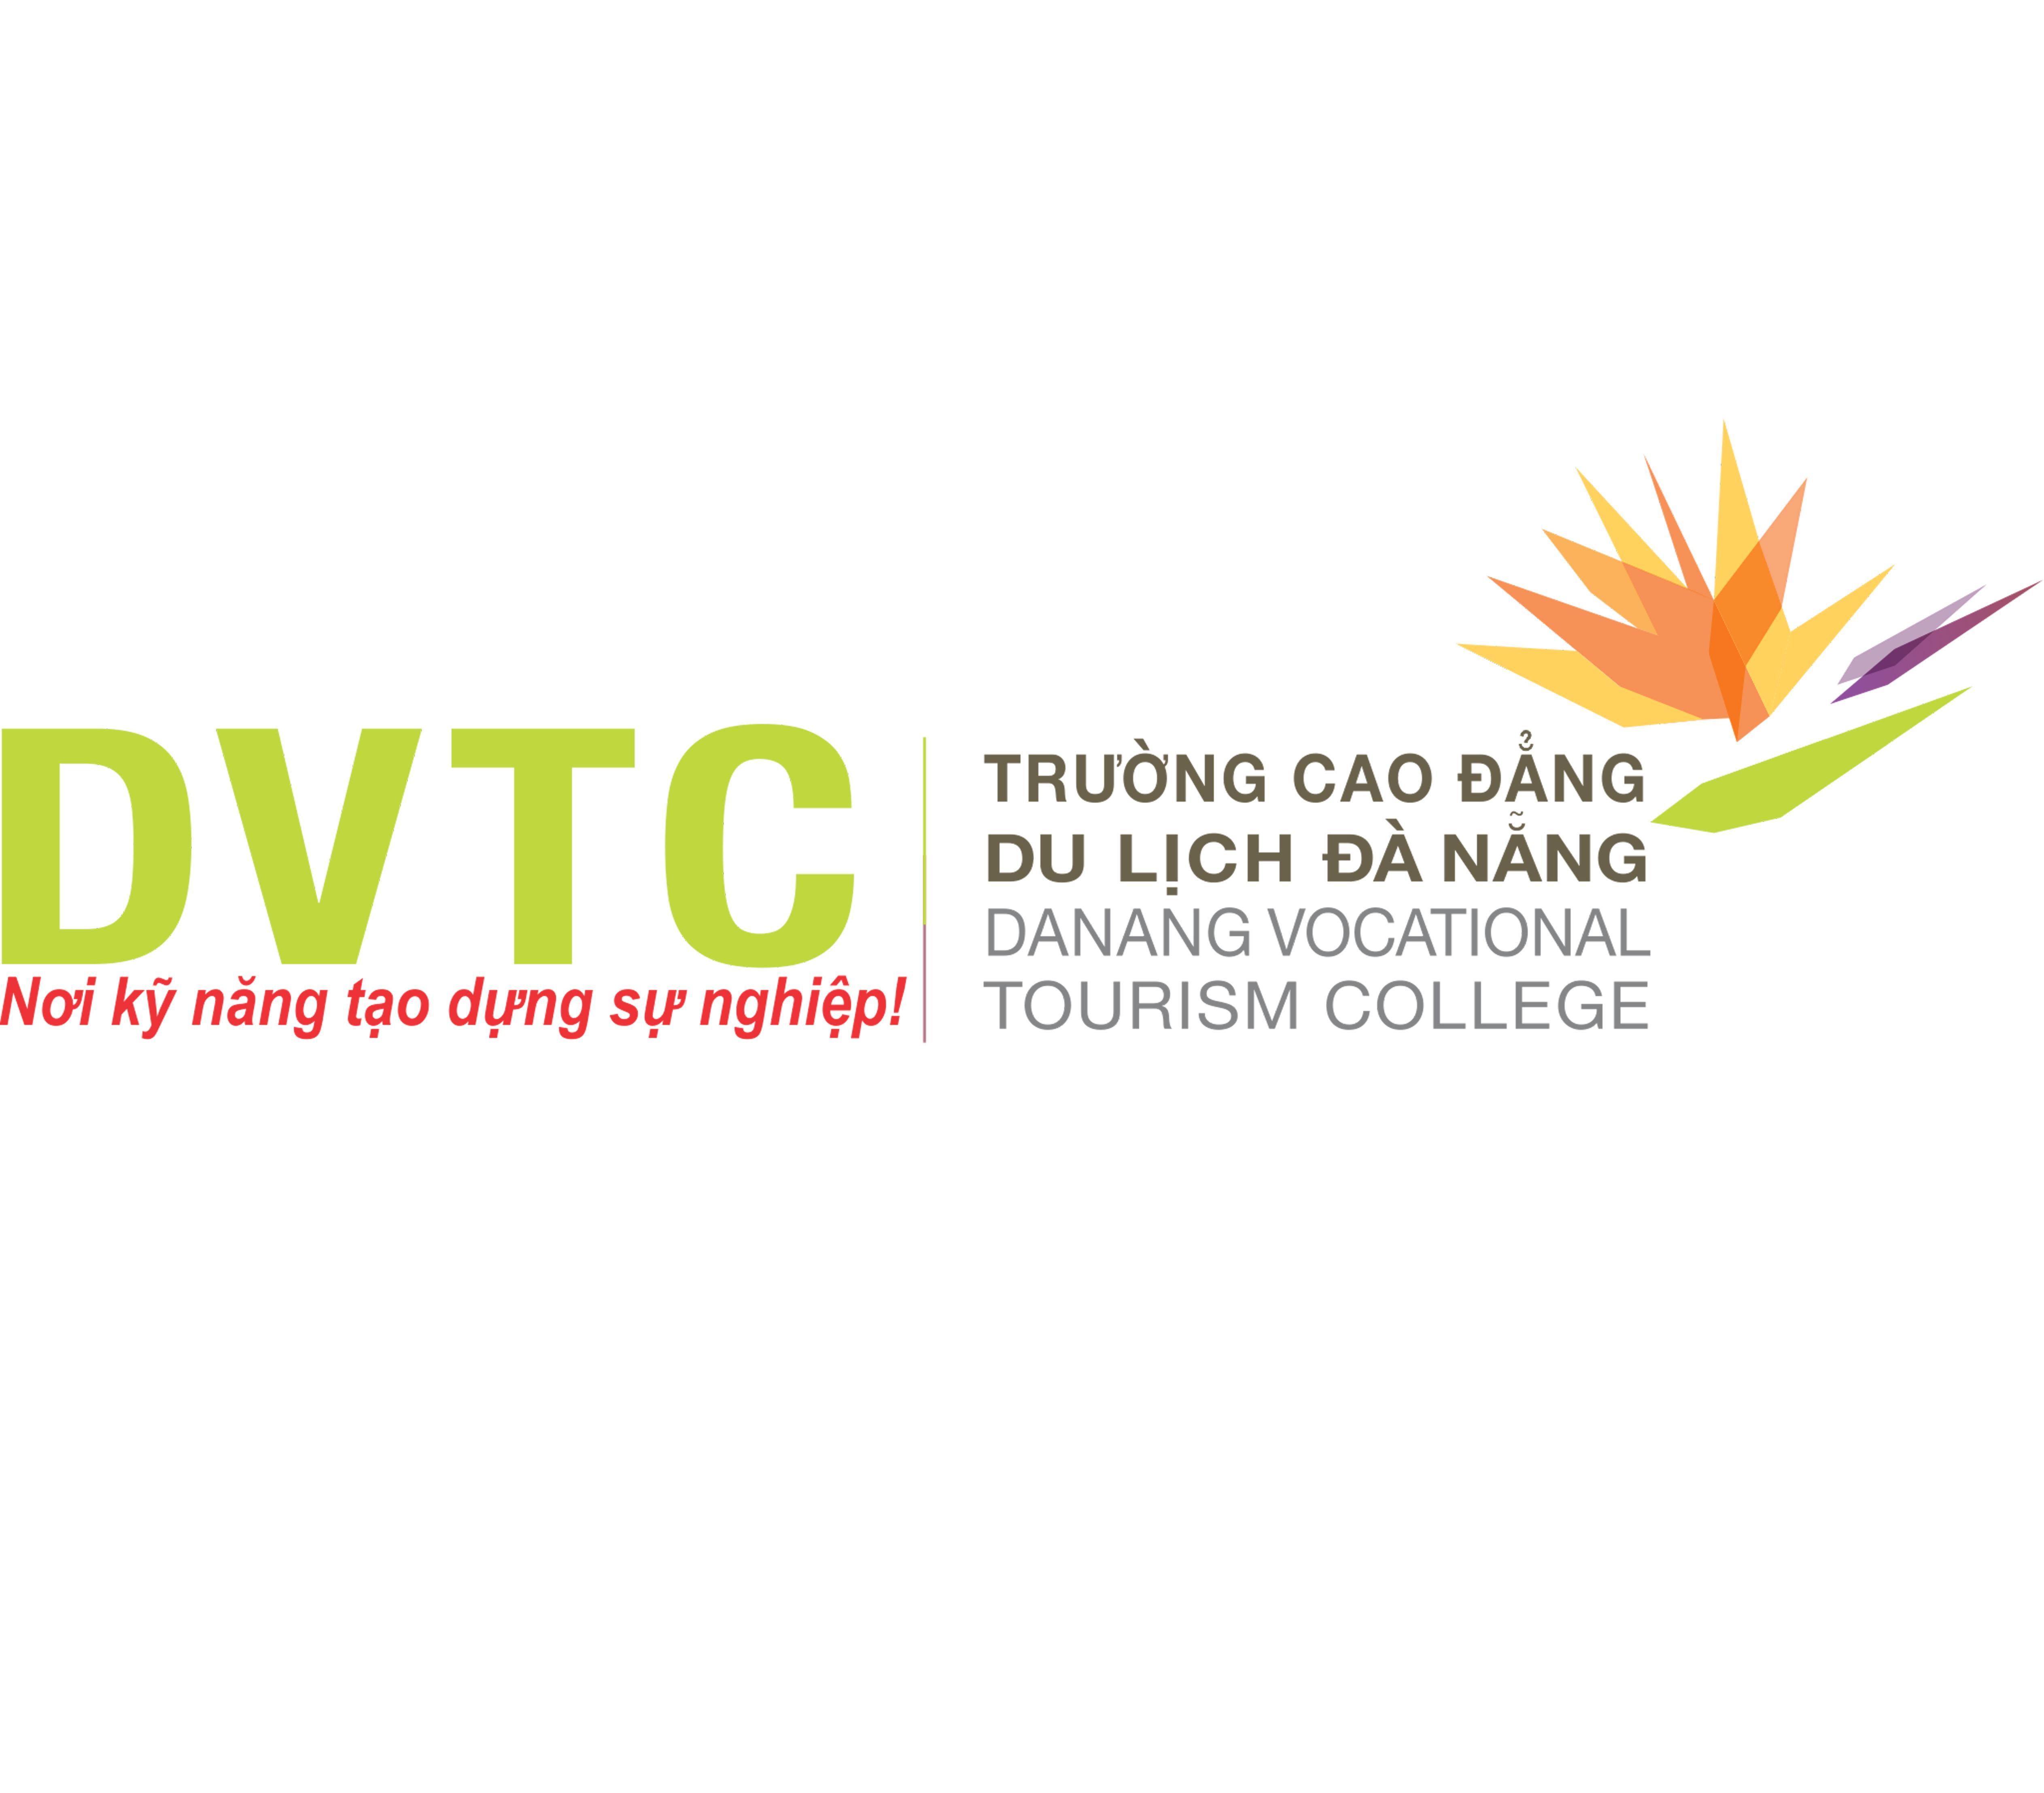 DANANG VOCATIONAL TOURISM COLLEGE